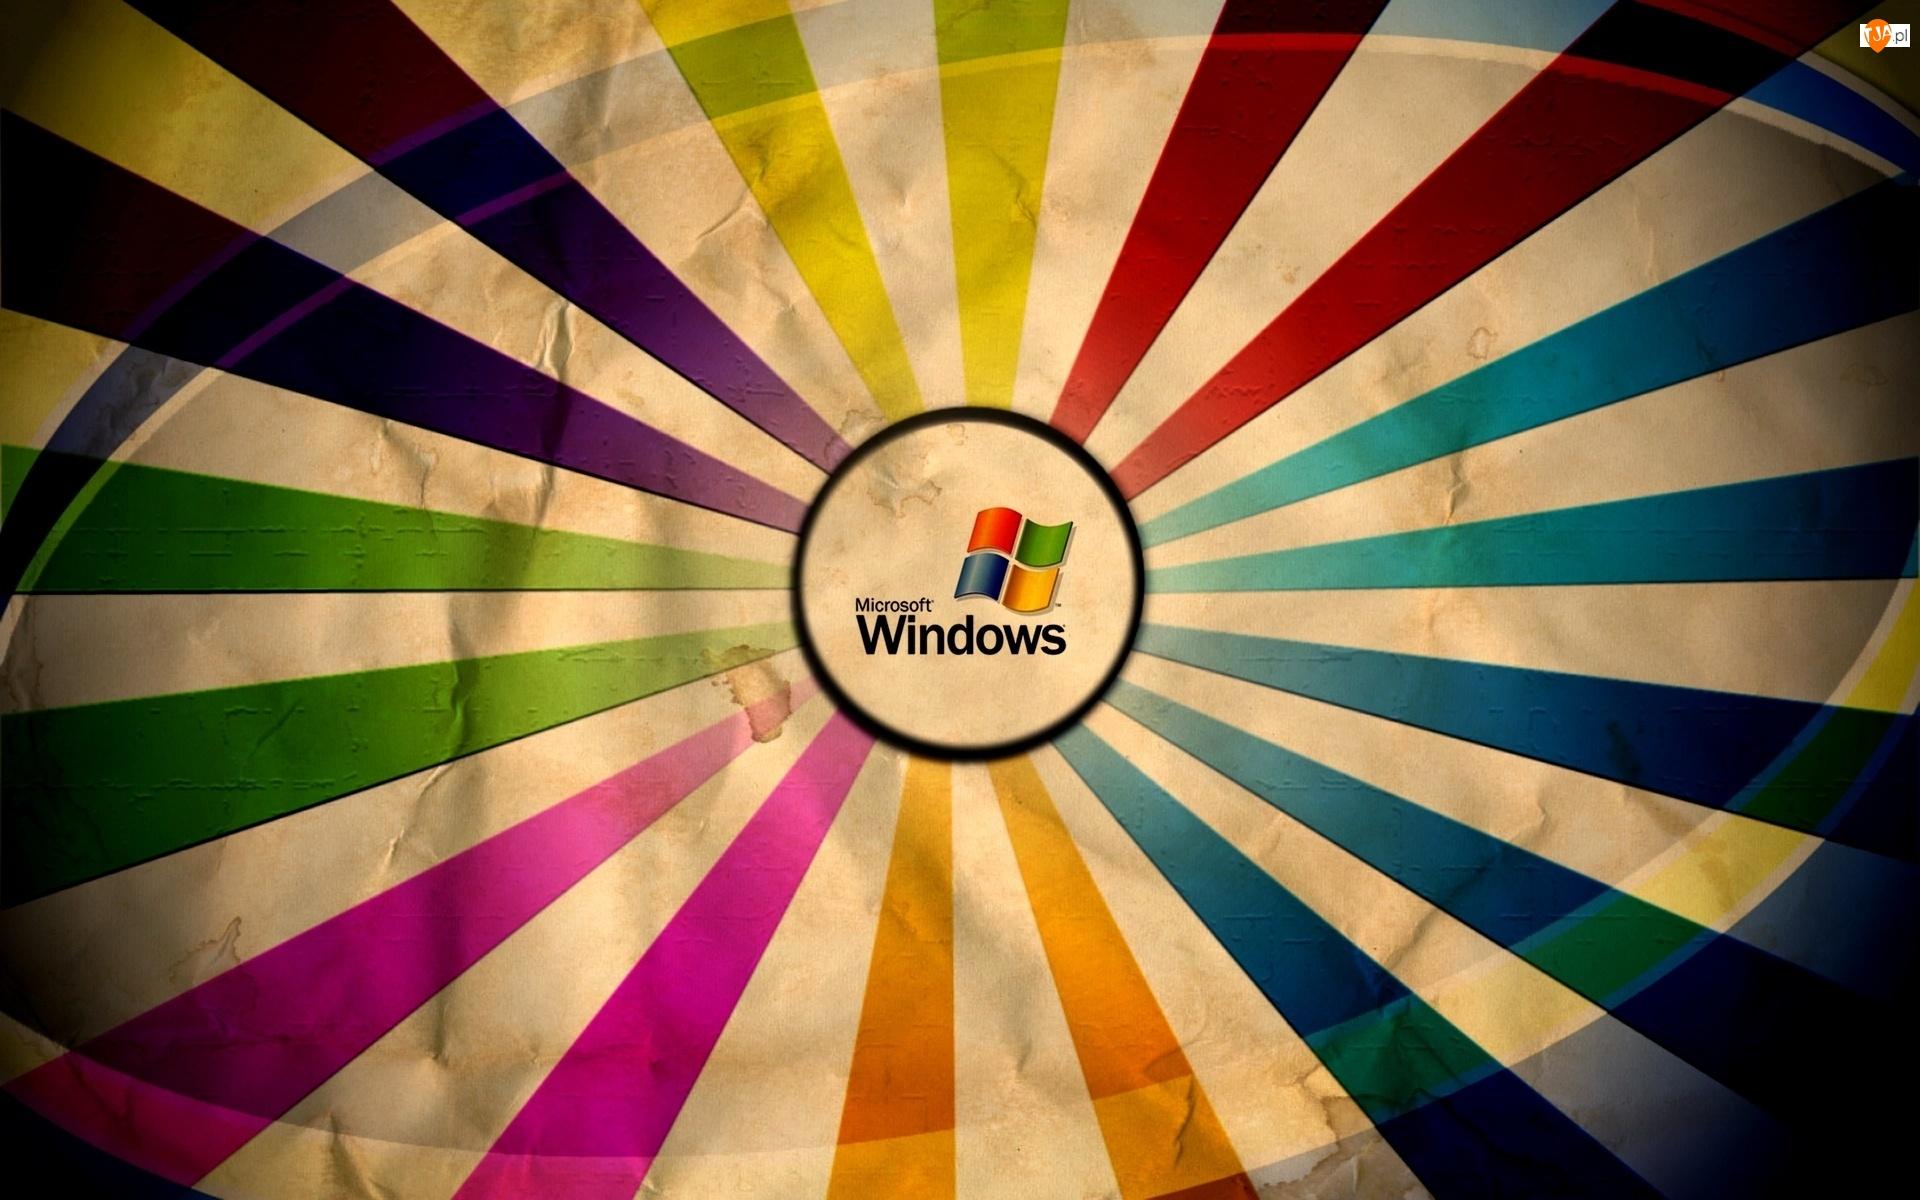 Windows, XP